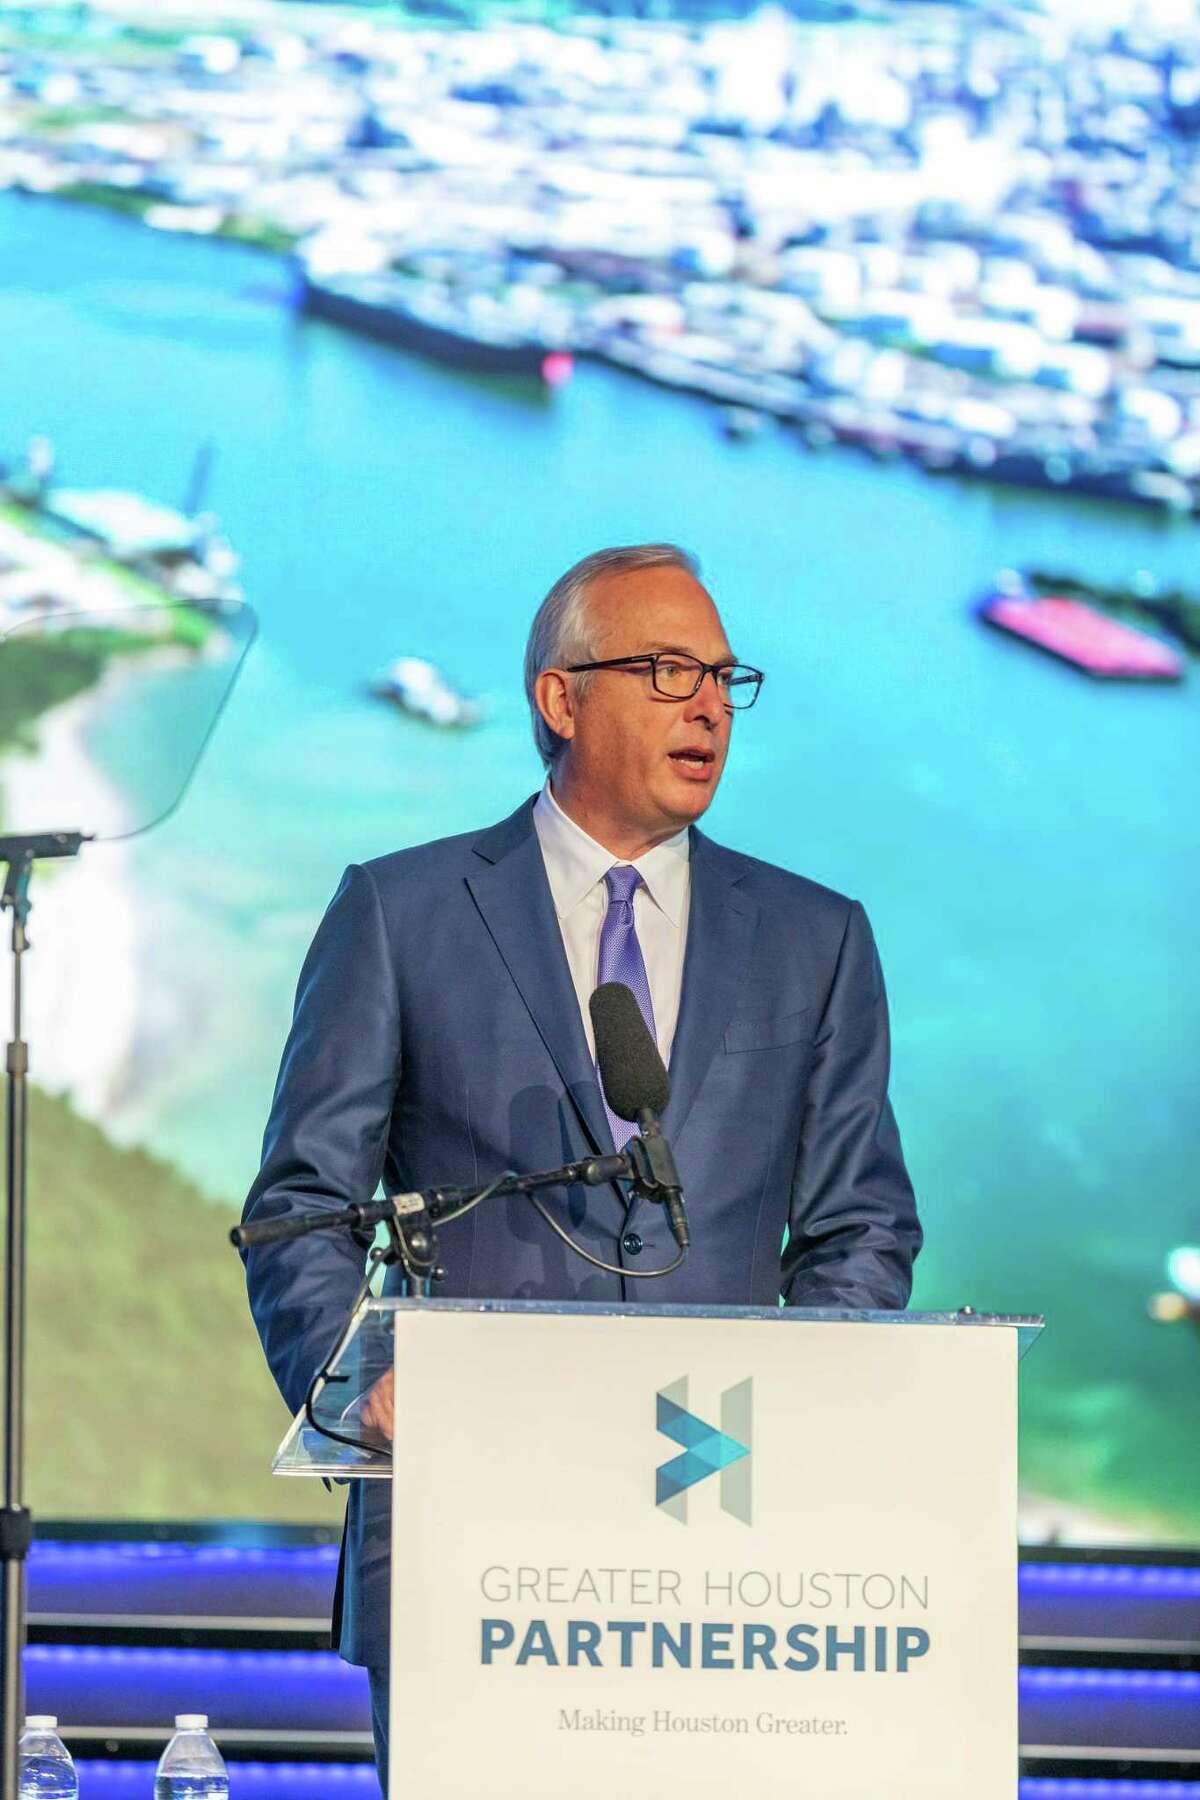 Bobby Tudor addresses the Greater Houston Partnership annual meeting on Jan. 22, 2020.